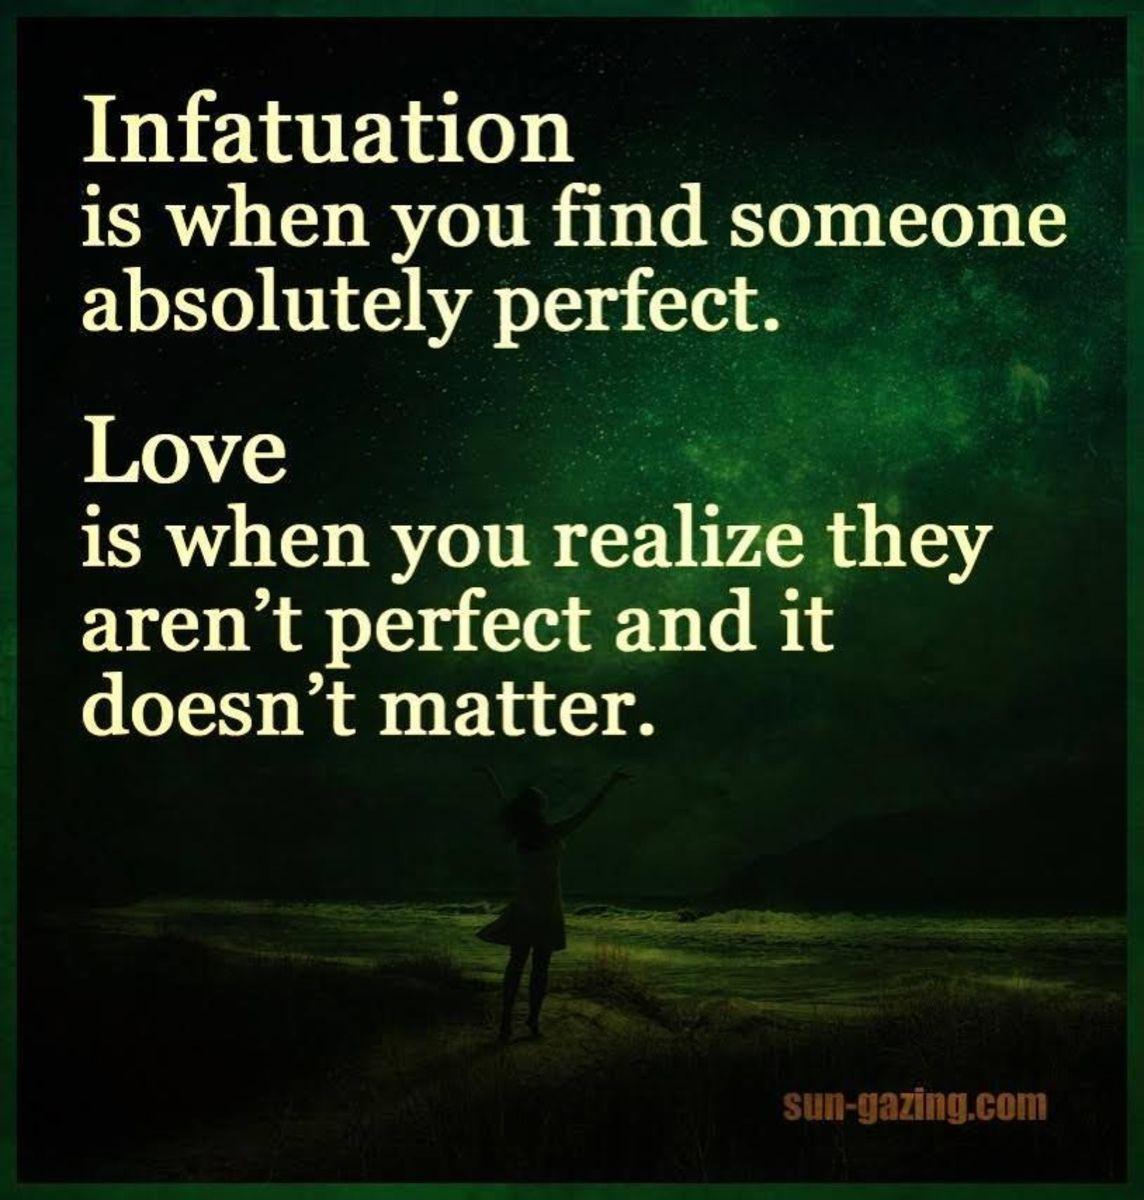 poem-is-it-infatuation